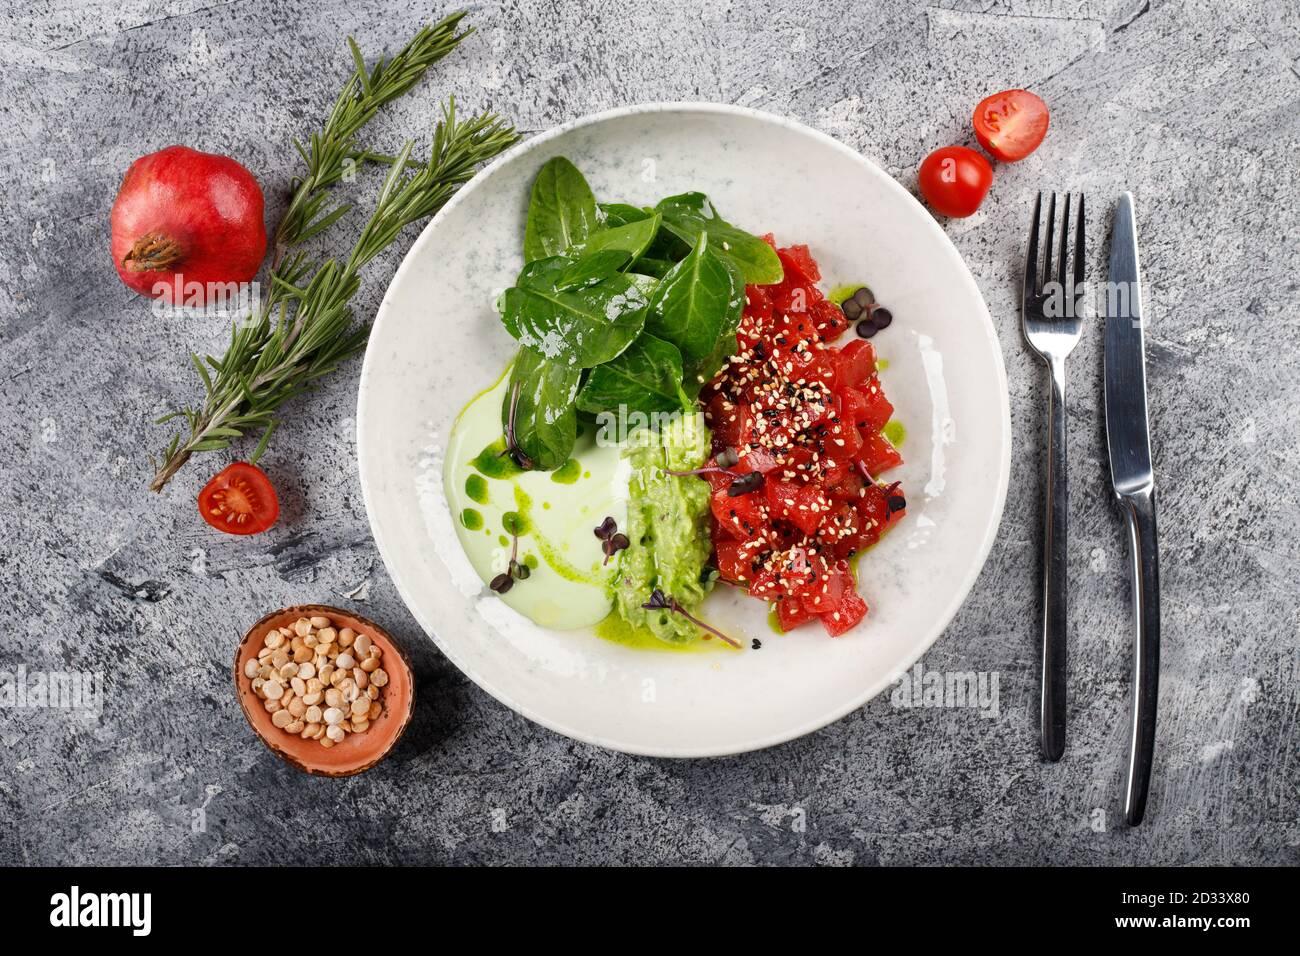 Exquisito pescado tartar filete de atún crudo con verdes de cerca en un plato blanco Foto de stock